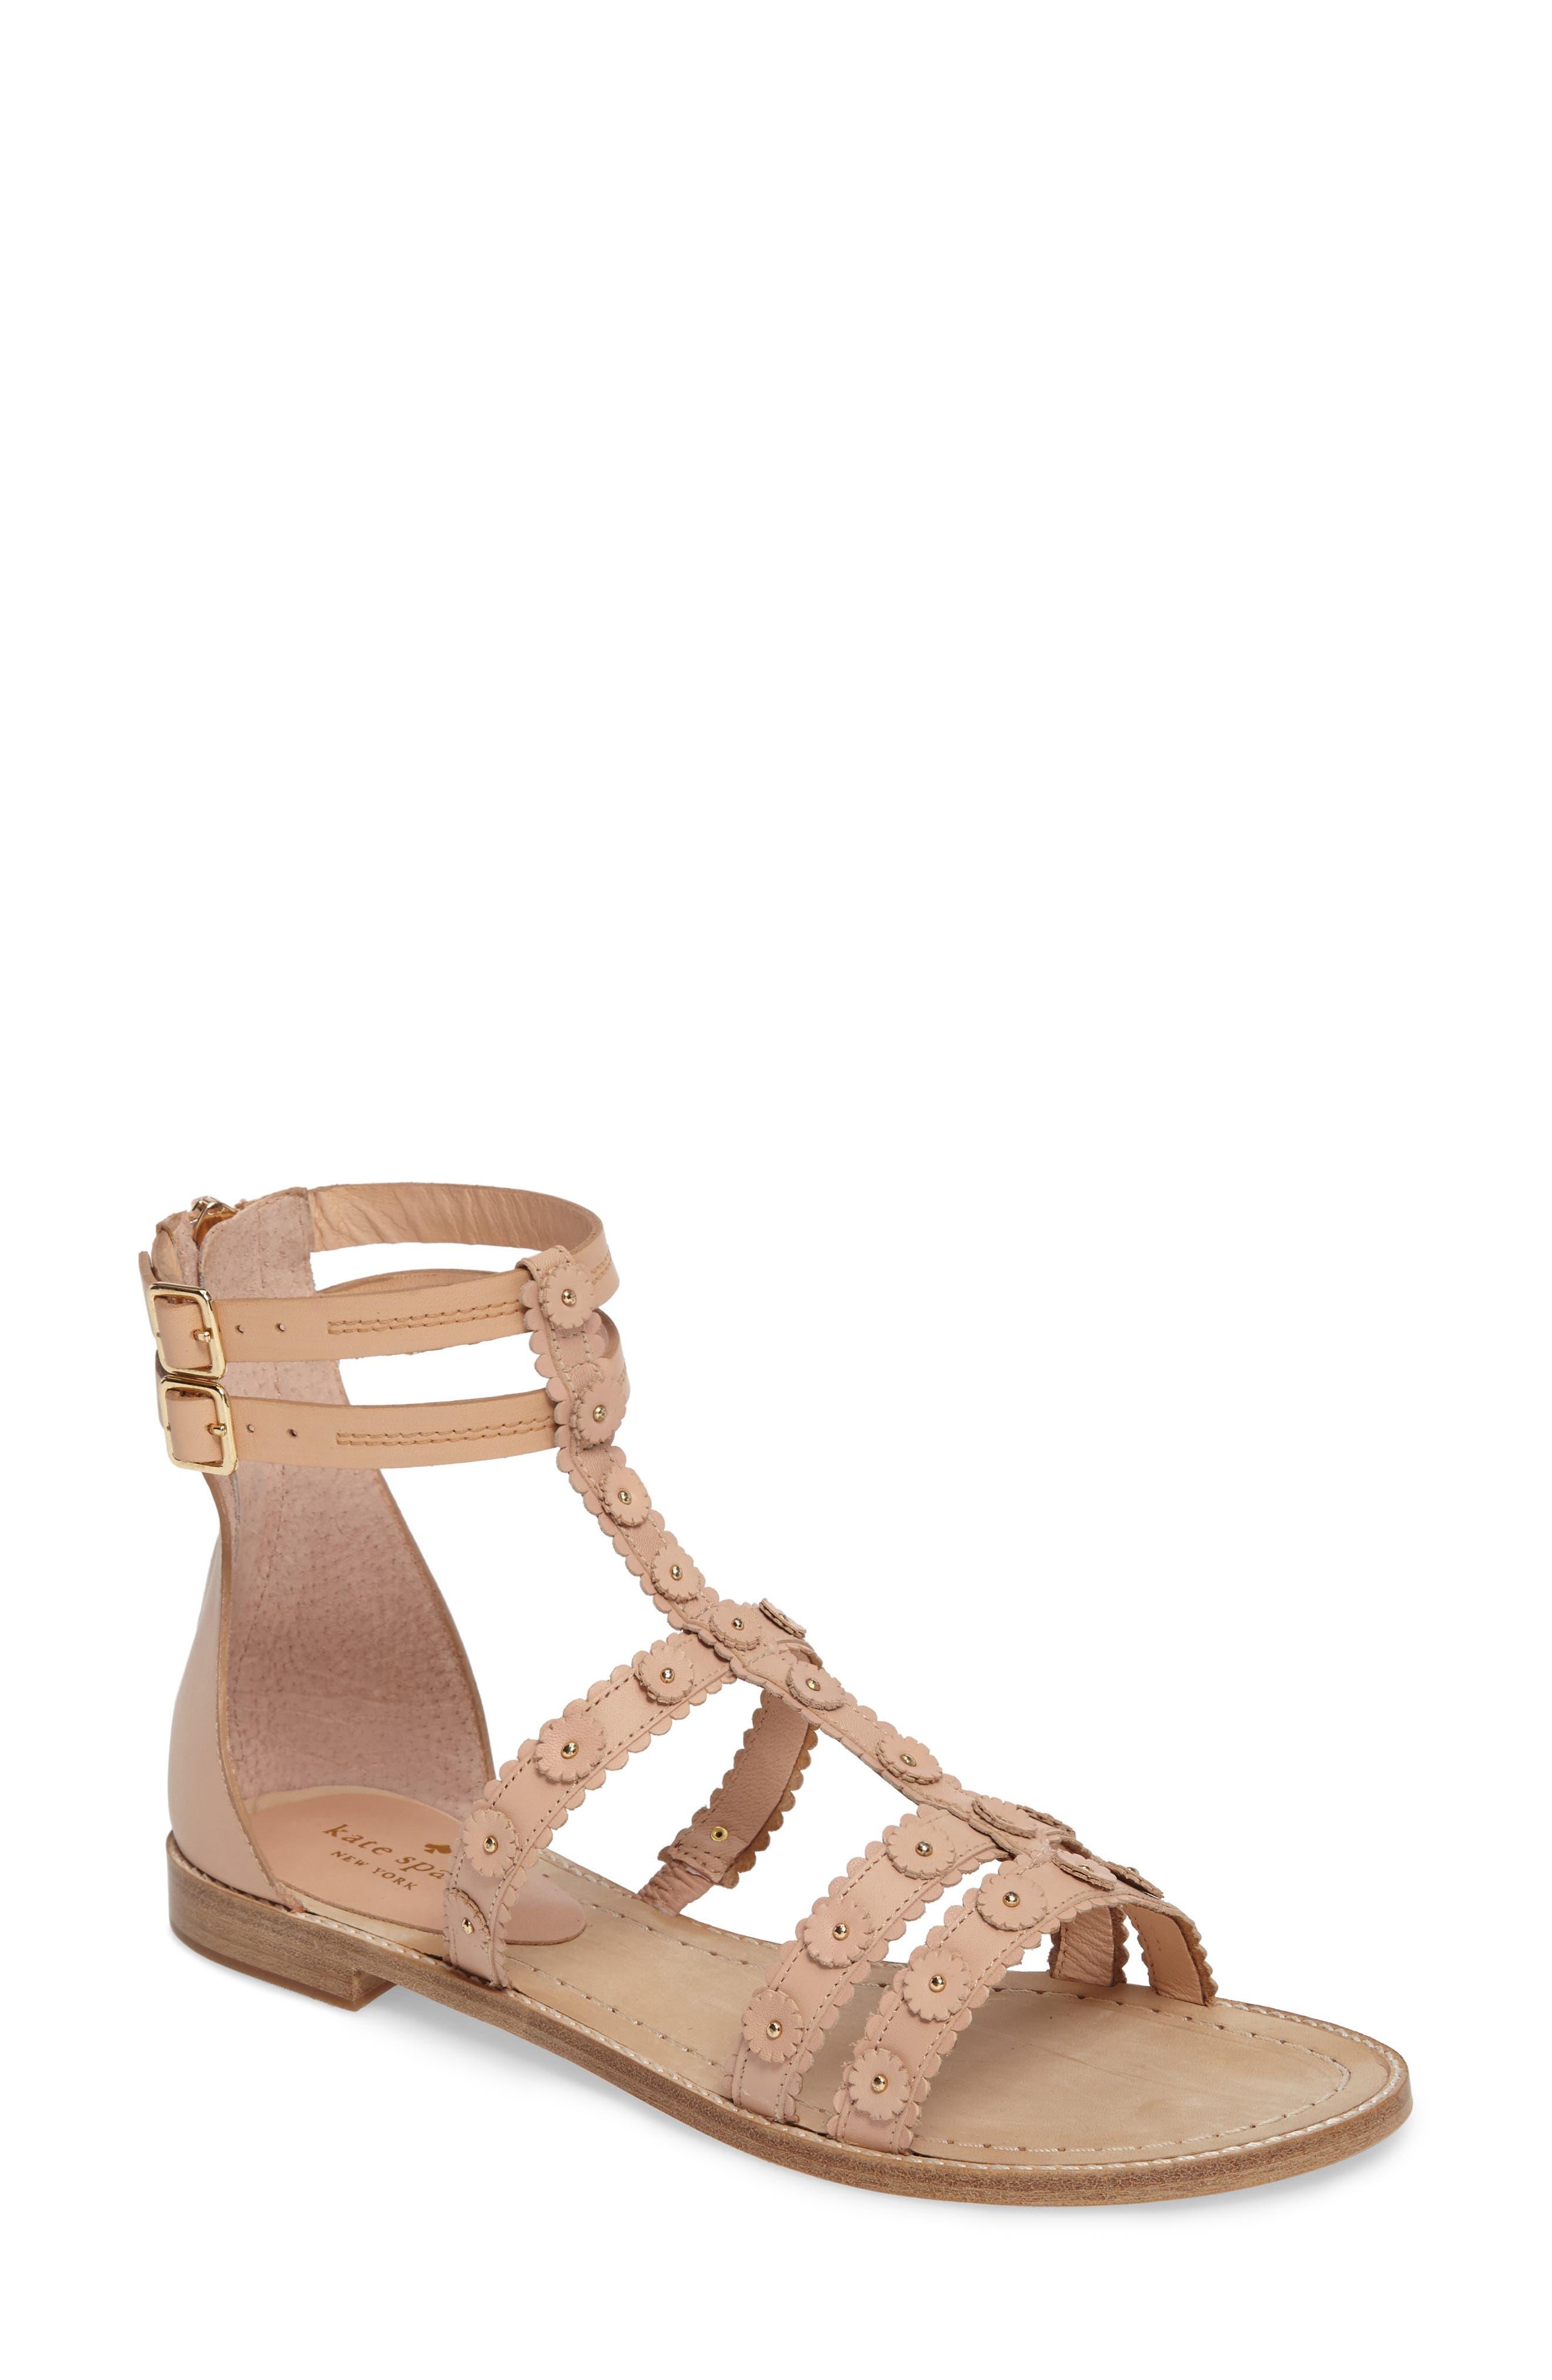 Main Image - kate spade new york santina sandal (Women)